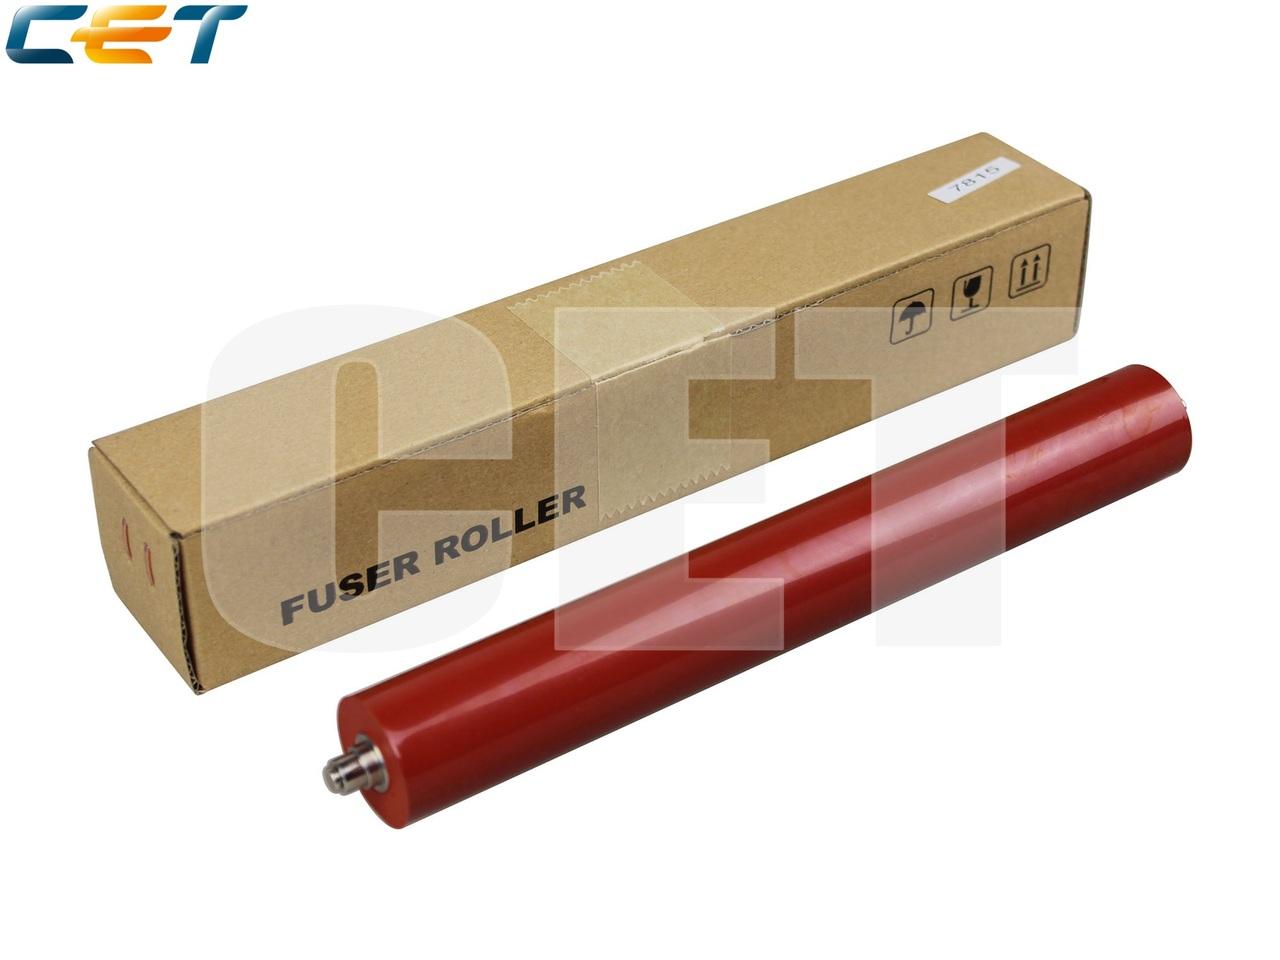 Резиновый вал для KYOCERA FS-4100DN/4200DN, ECOSYSP3045dn/M3550idn (CET), CET7815